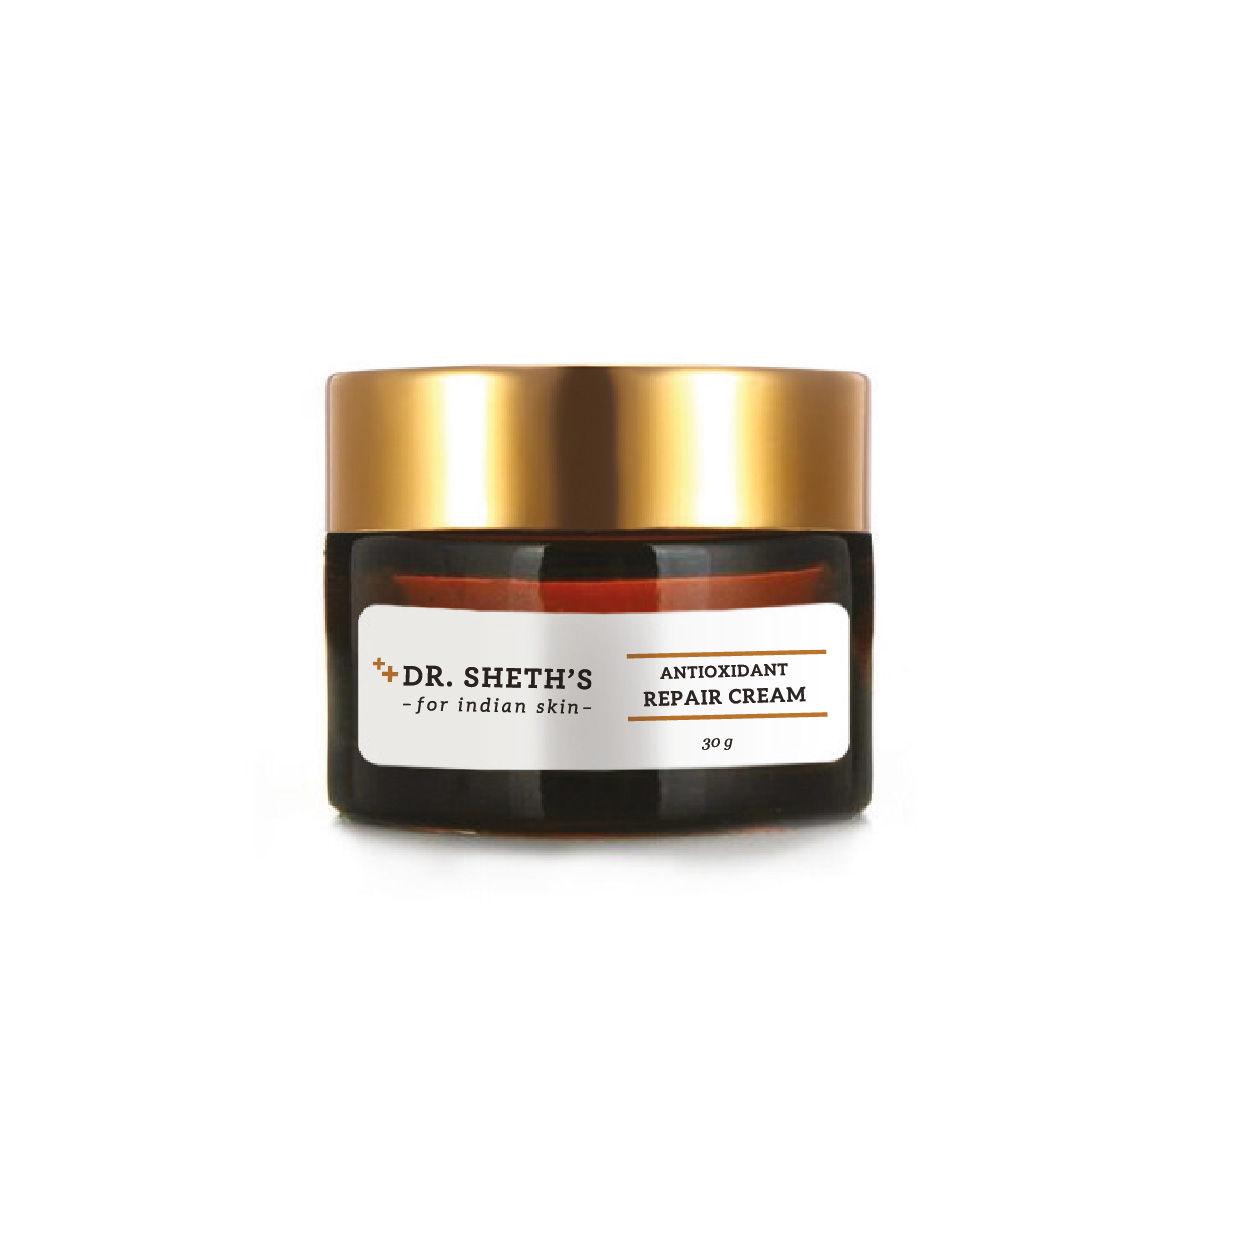 Dr. Sheth&39;s Antioxidant Repair Cream